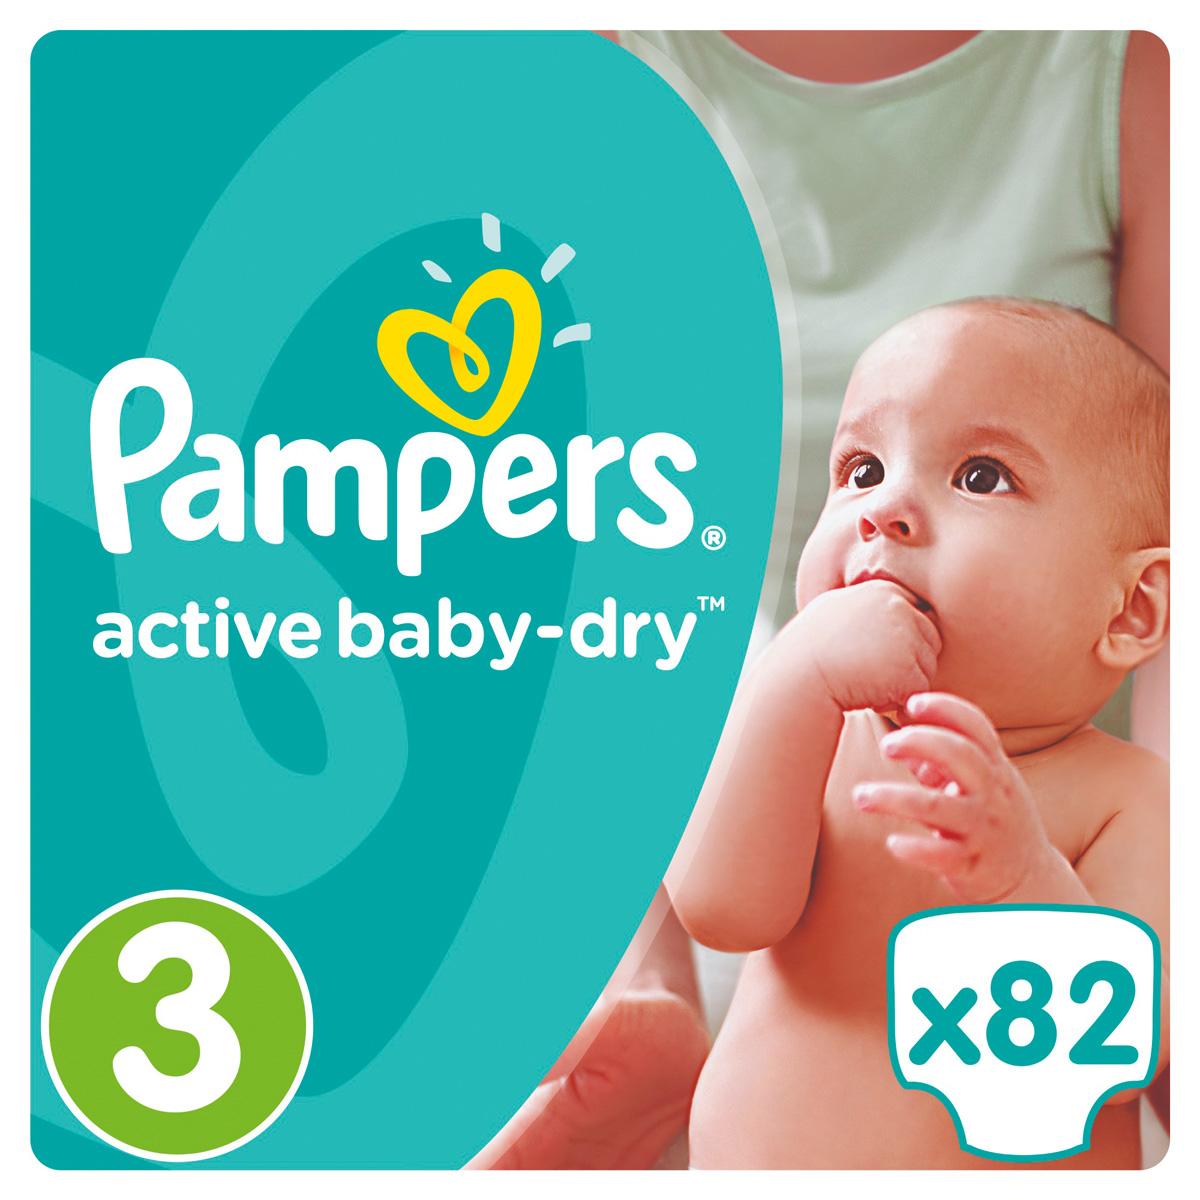 Pampers Подгузники Active Baby-Dry 5-9 кг (размер 3) 82 шт подгузники pampers active baby dry размер 4 7 14 кг 132 шт